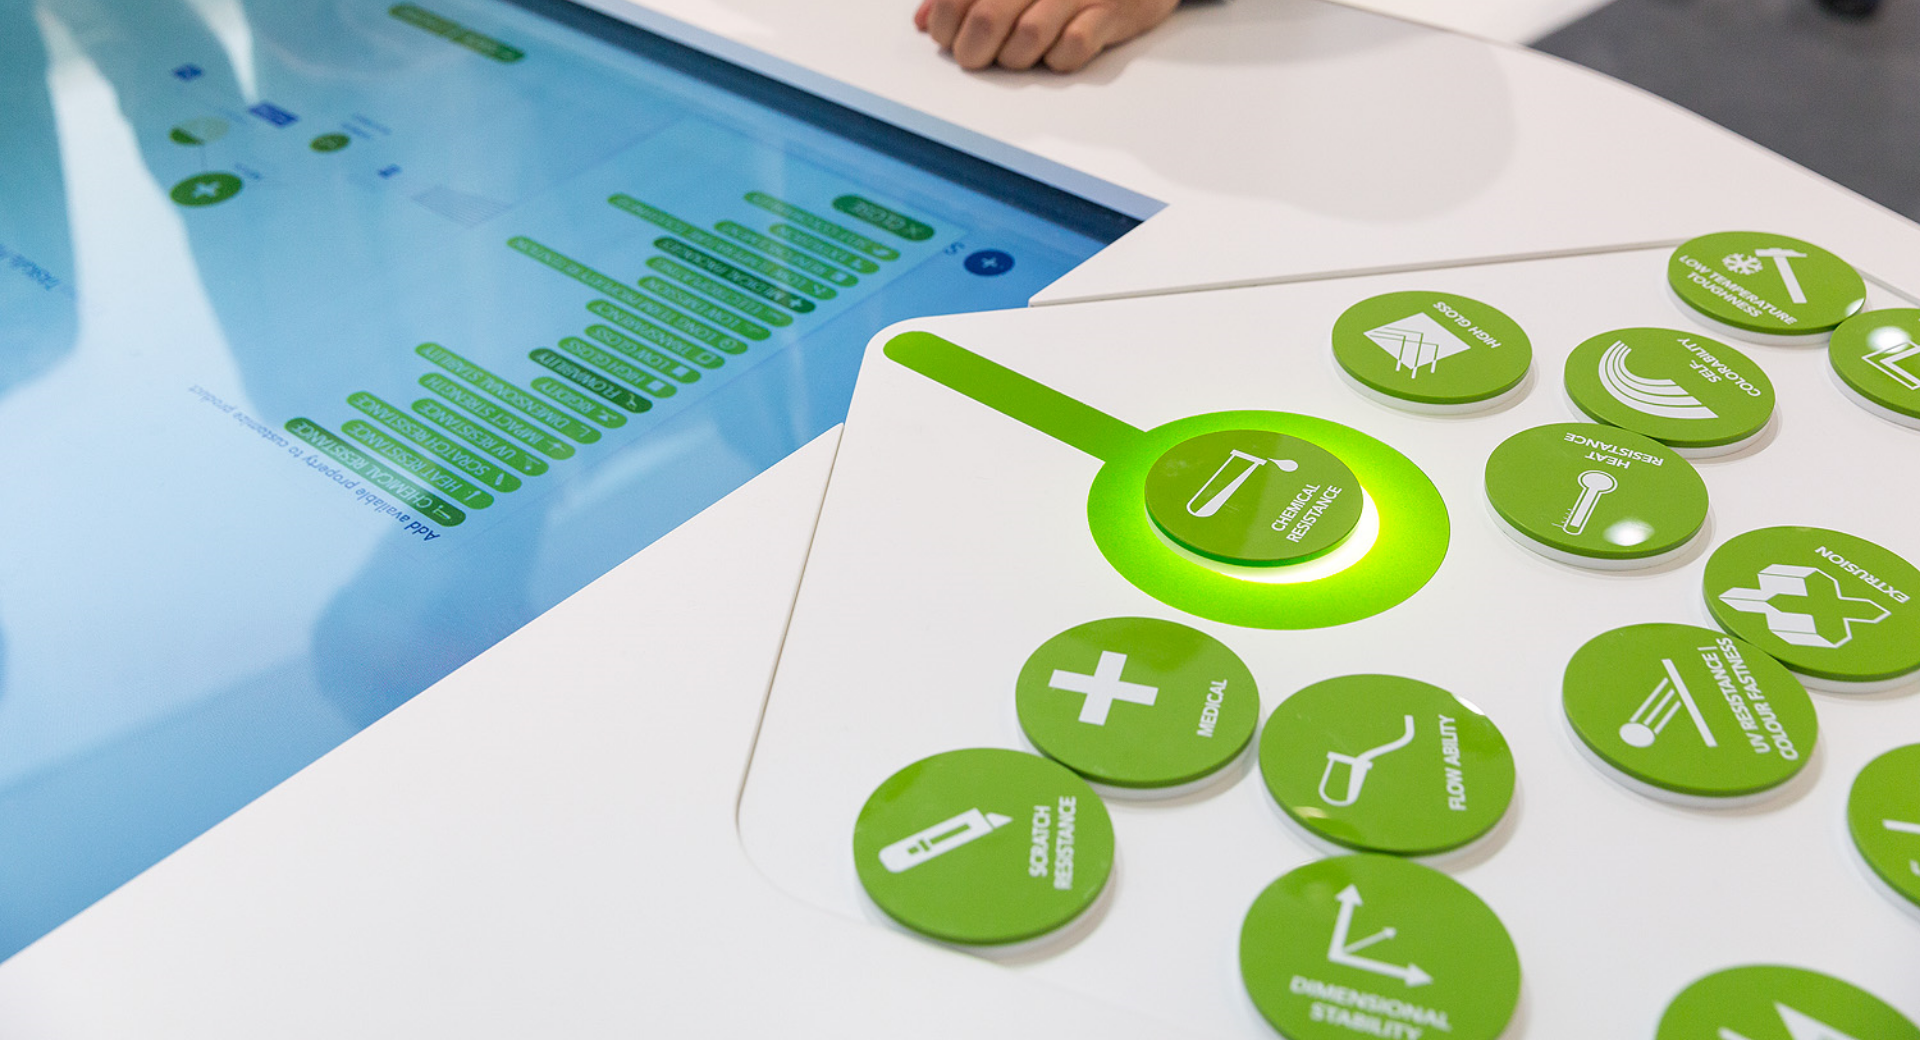 Styrolution - Interaktiver Tisch - Multitouch - Token - Objekterkennung - RFID - Messe - Interactive Experiences - realtime visions